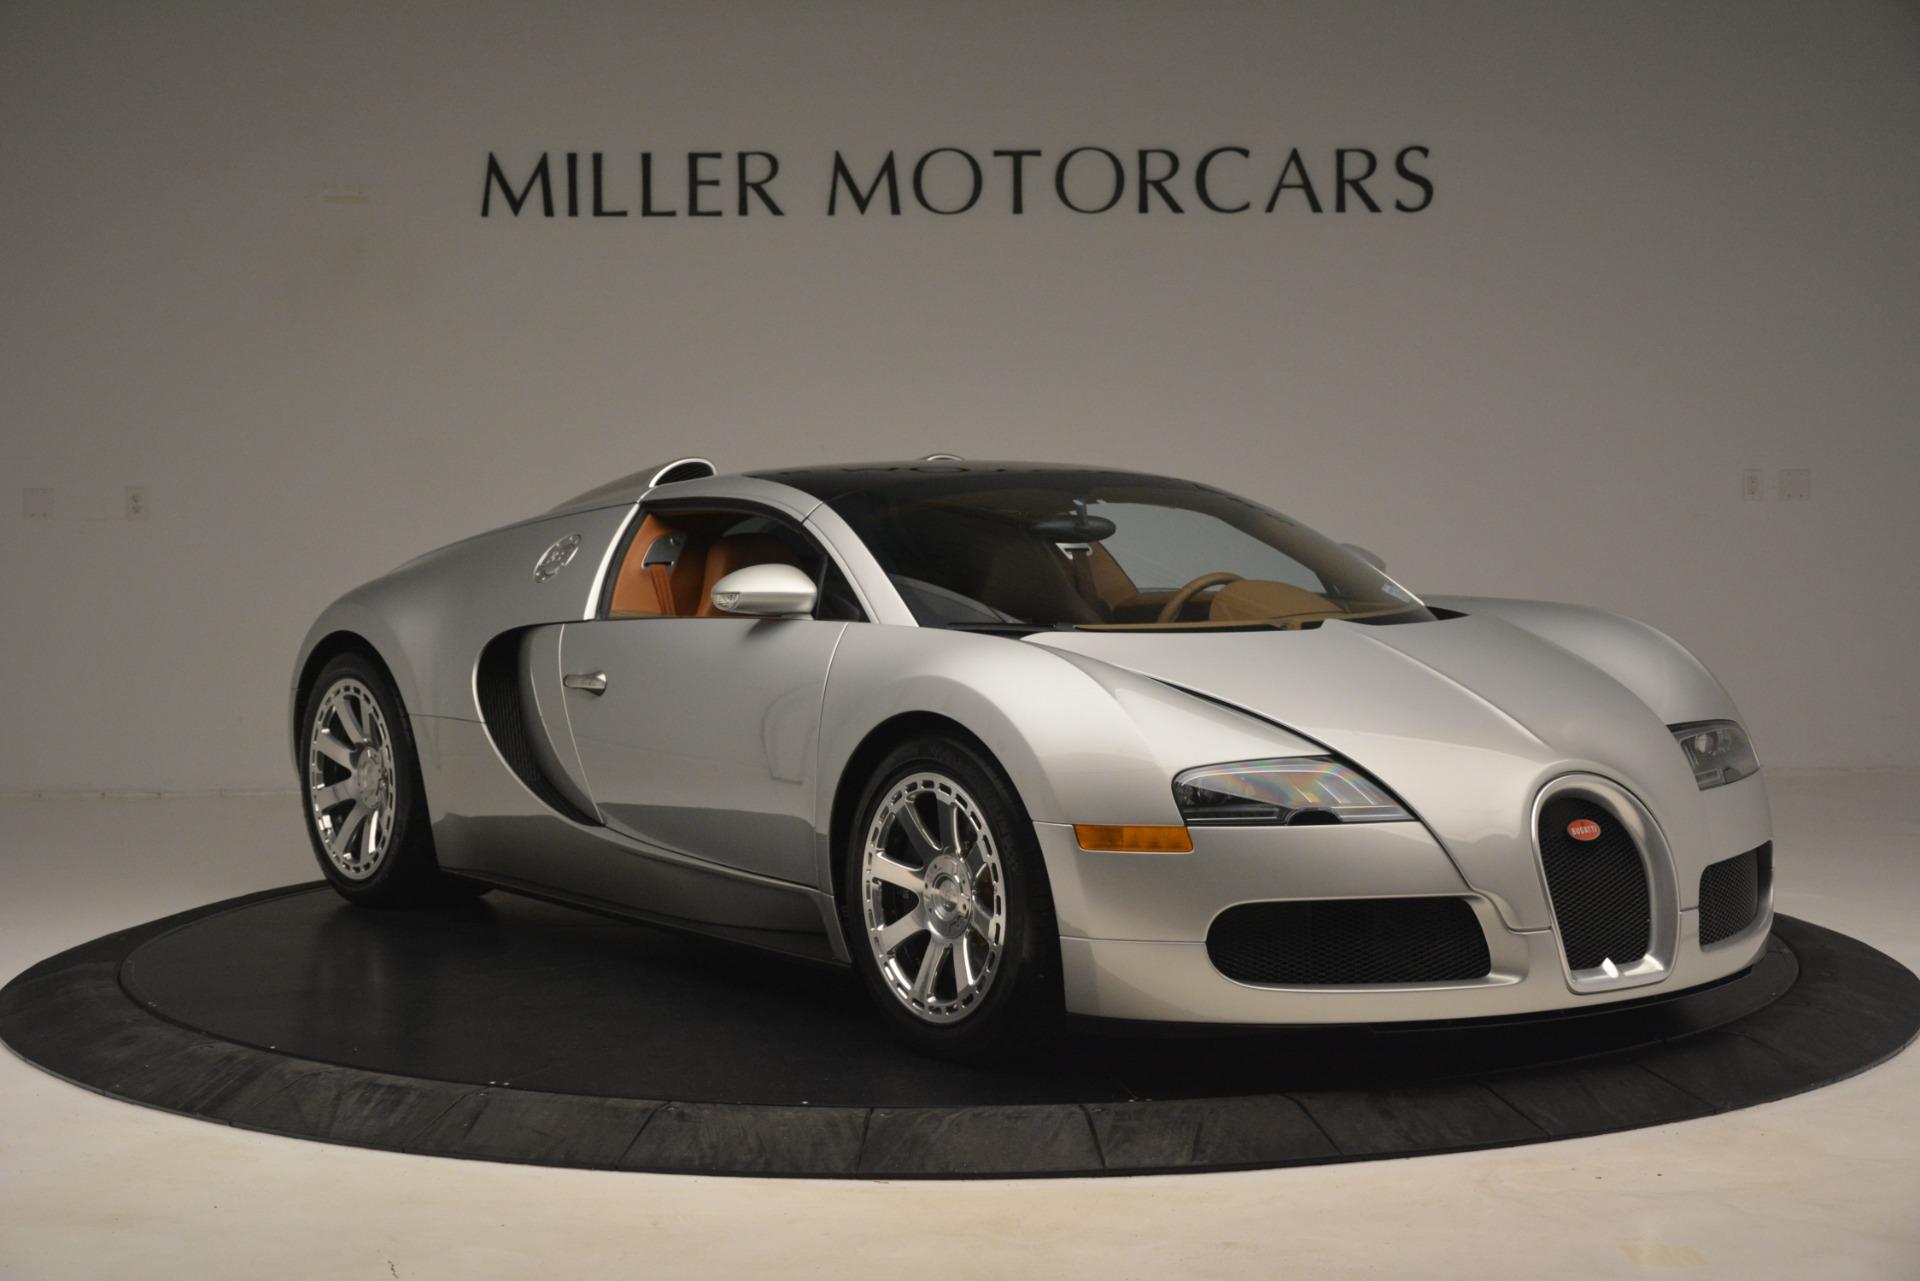 Used 2010 Bugatti Veyron 16.4 Grand Sport For Sale In Greenwich, CT 3159_p21